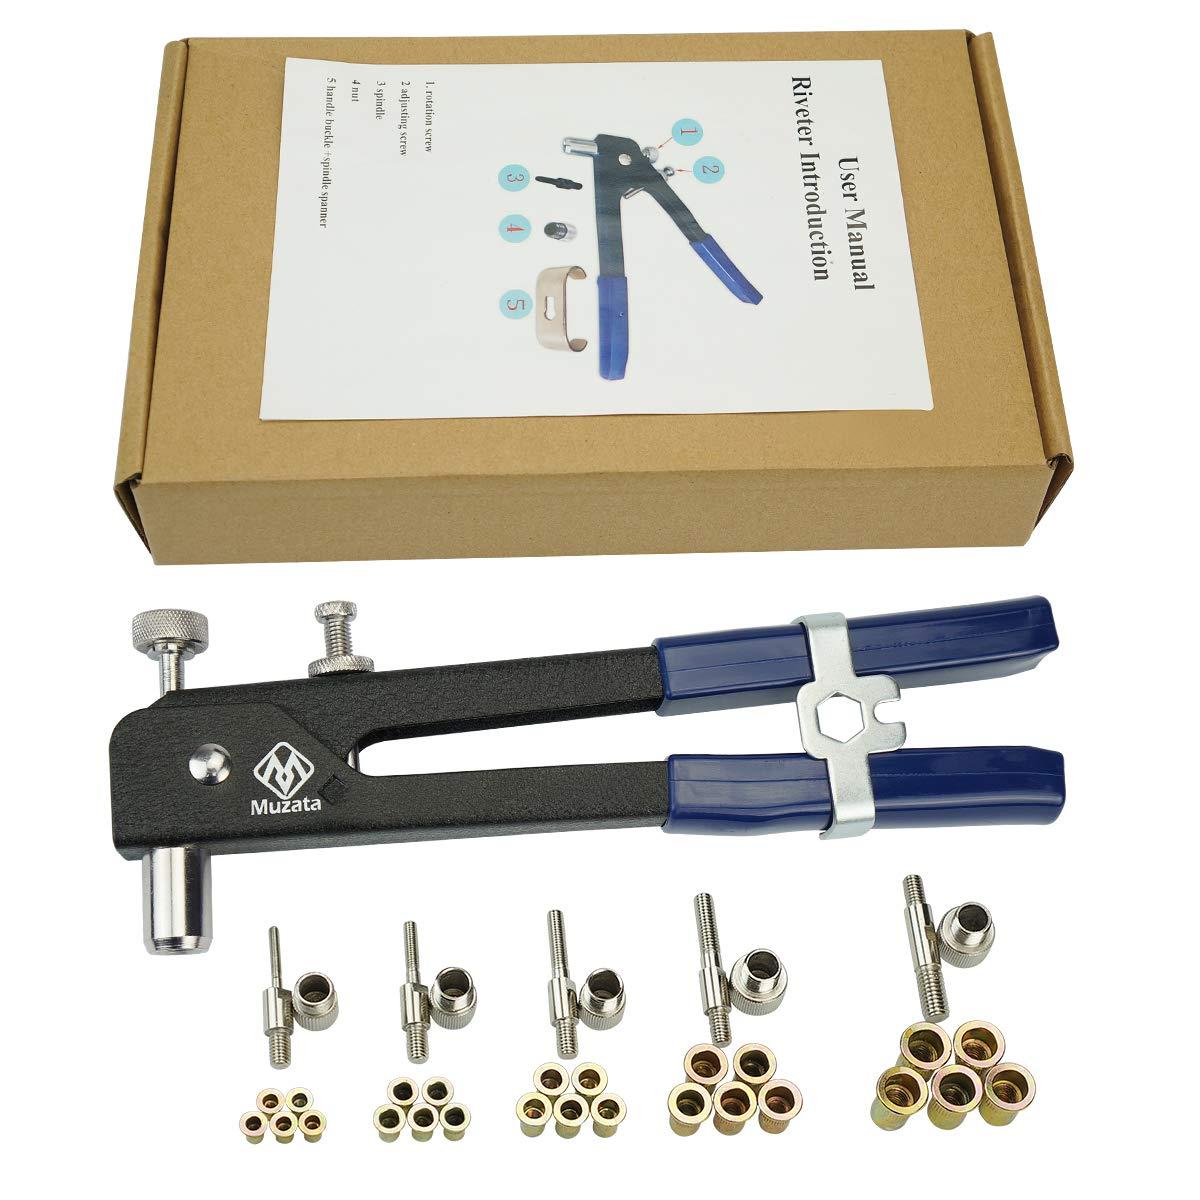 Muzata Heavy Duty Blind Rivet Nut Kit Set, Riveter Tool, Rivet Nut Gun, Rivet Gun, Riveting Tools, Thread Hand Riveter with 250PCS Rivet Nuts by Muzata (Image #1)